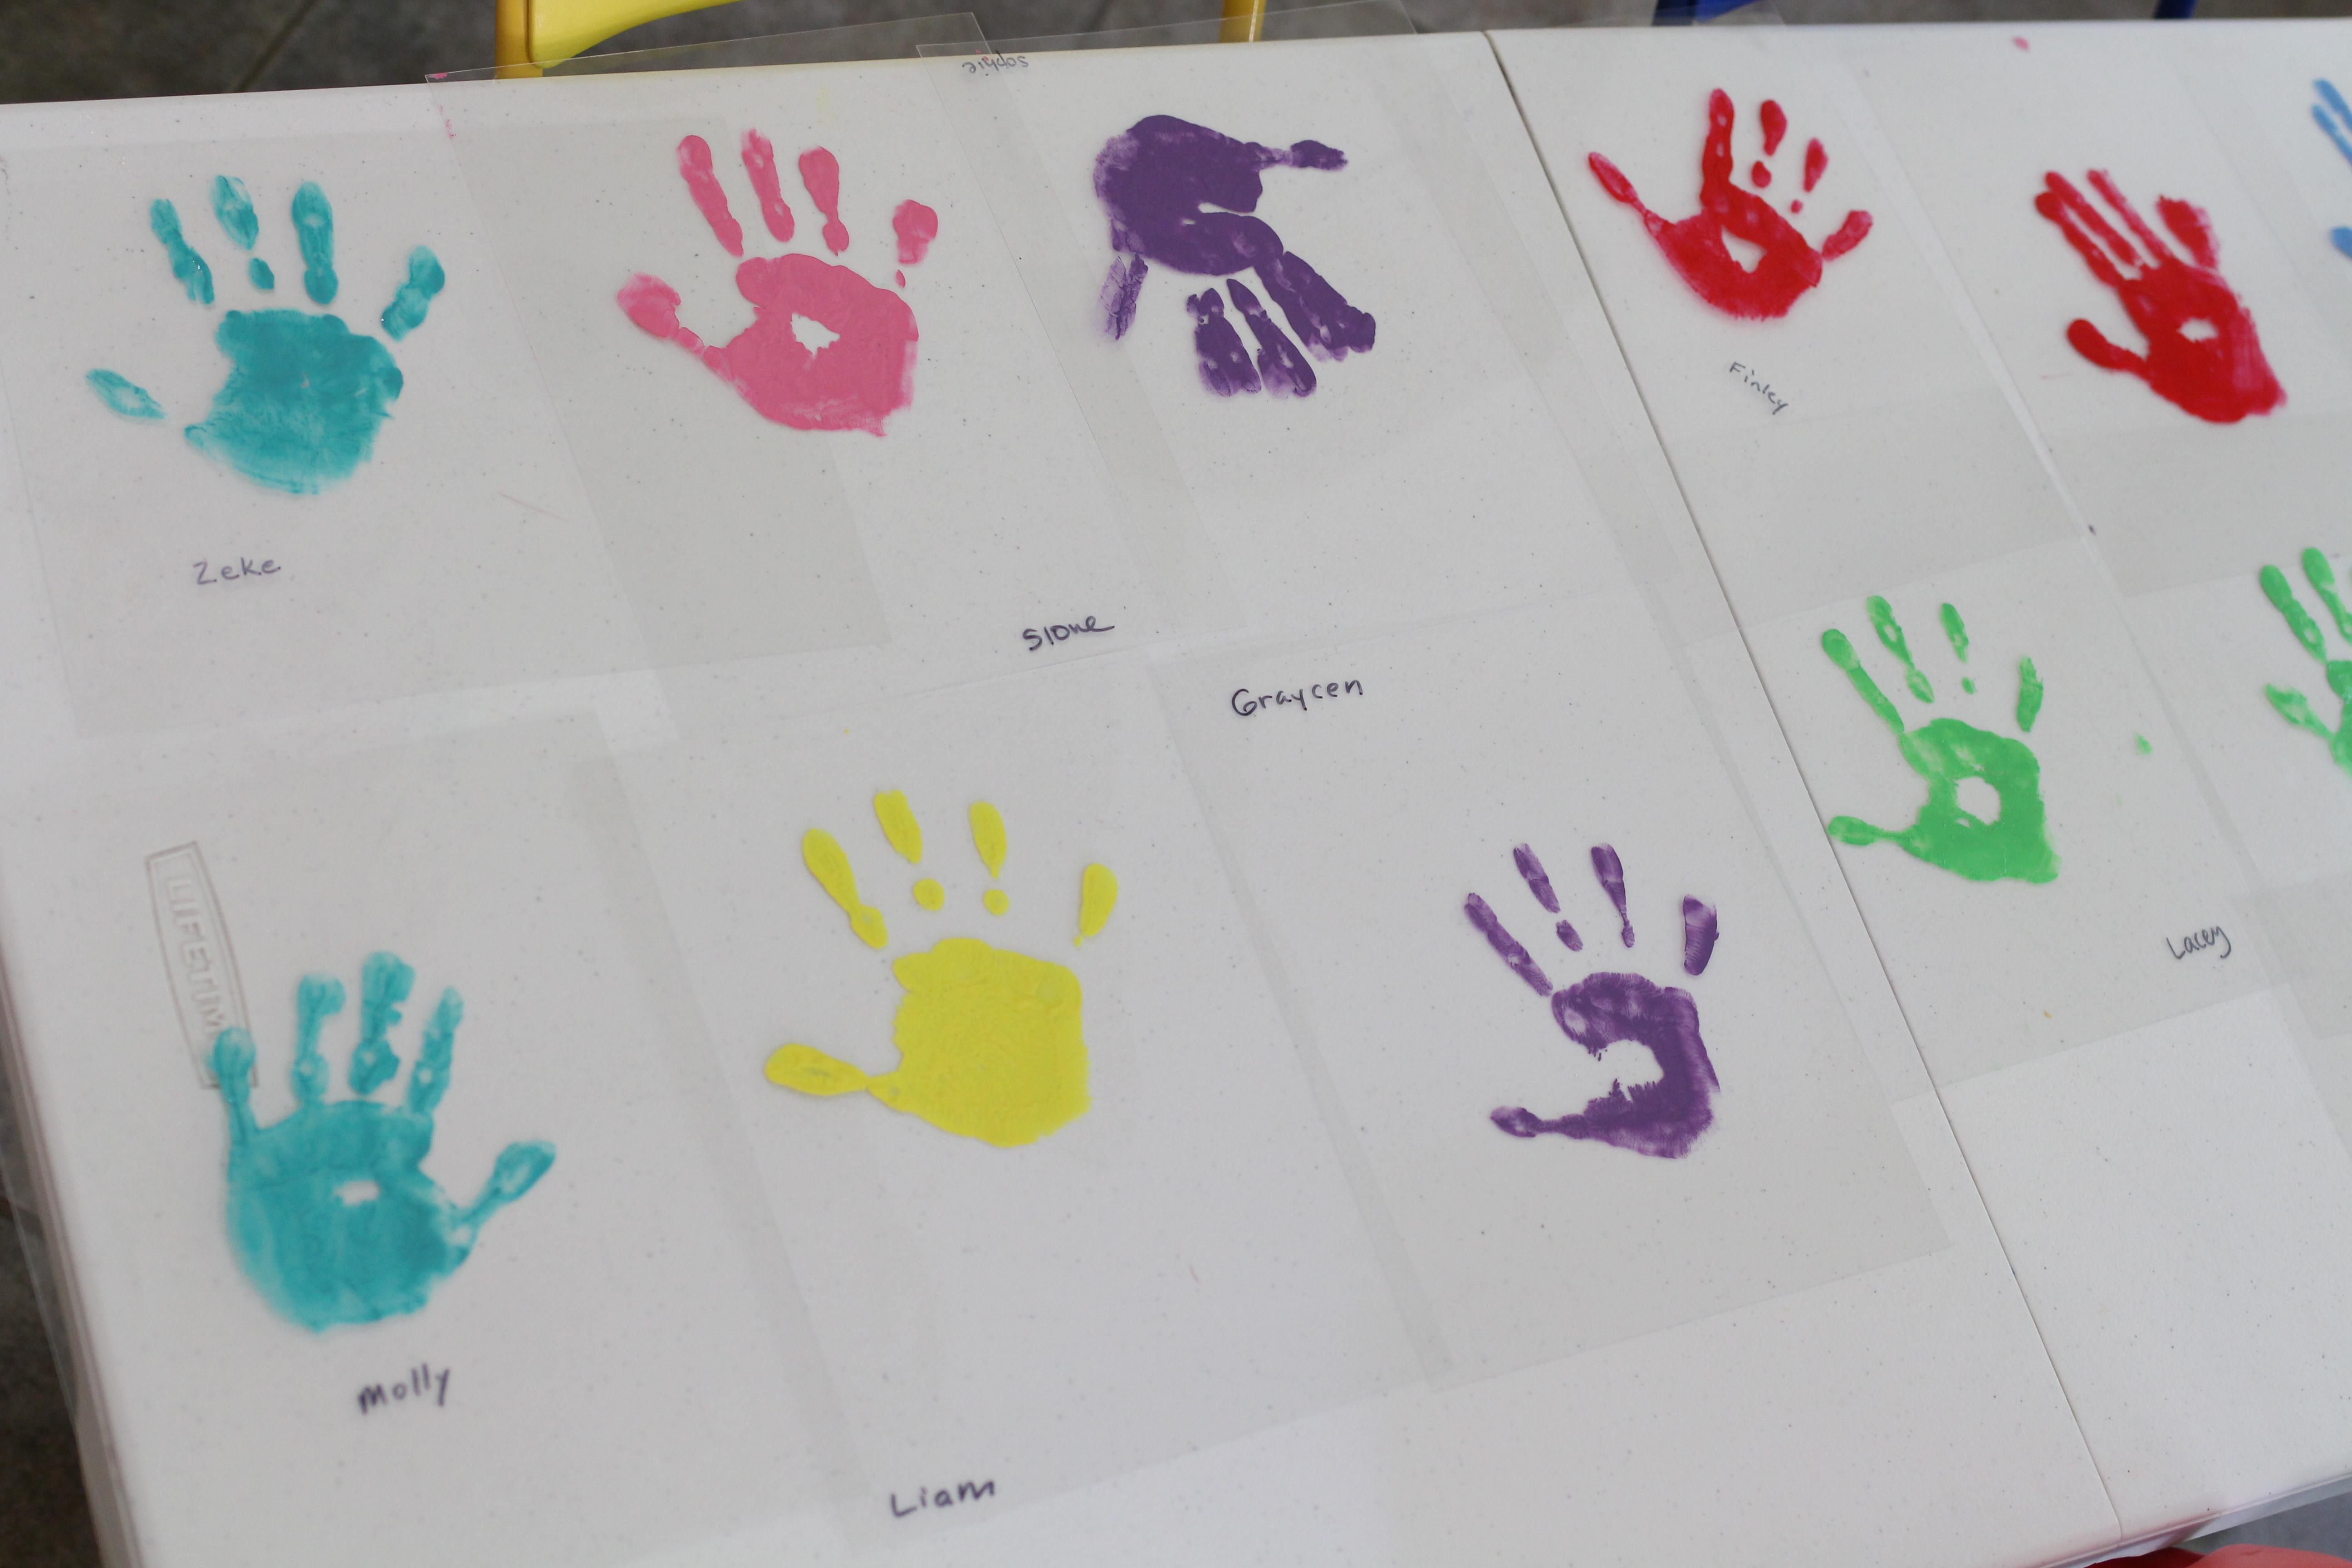 Father S Day T Ideas For Preschoolers Teach Preschool